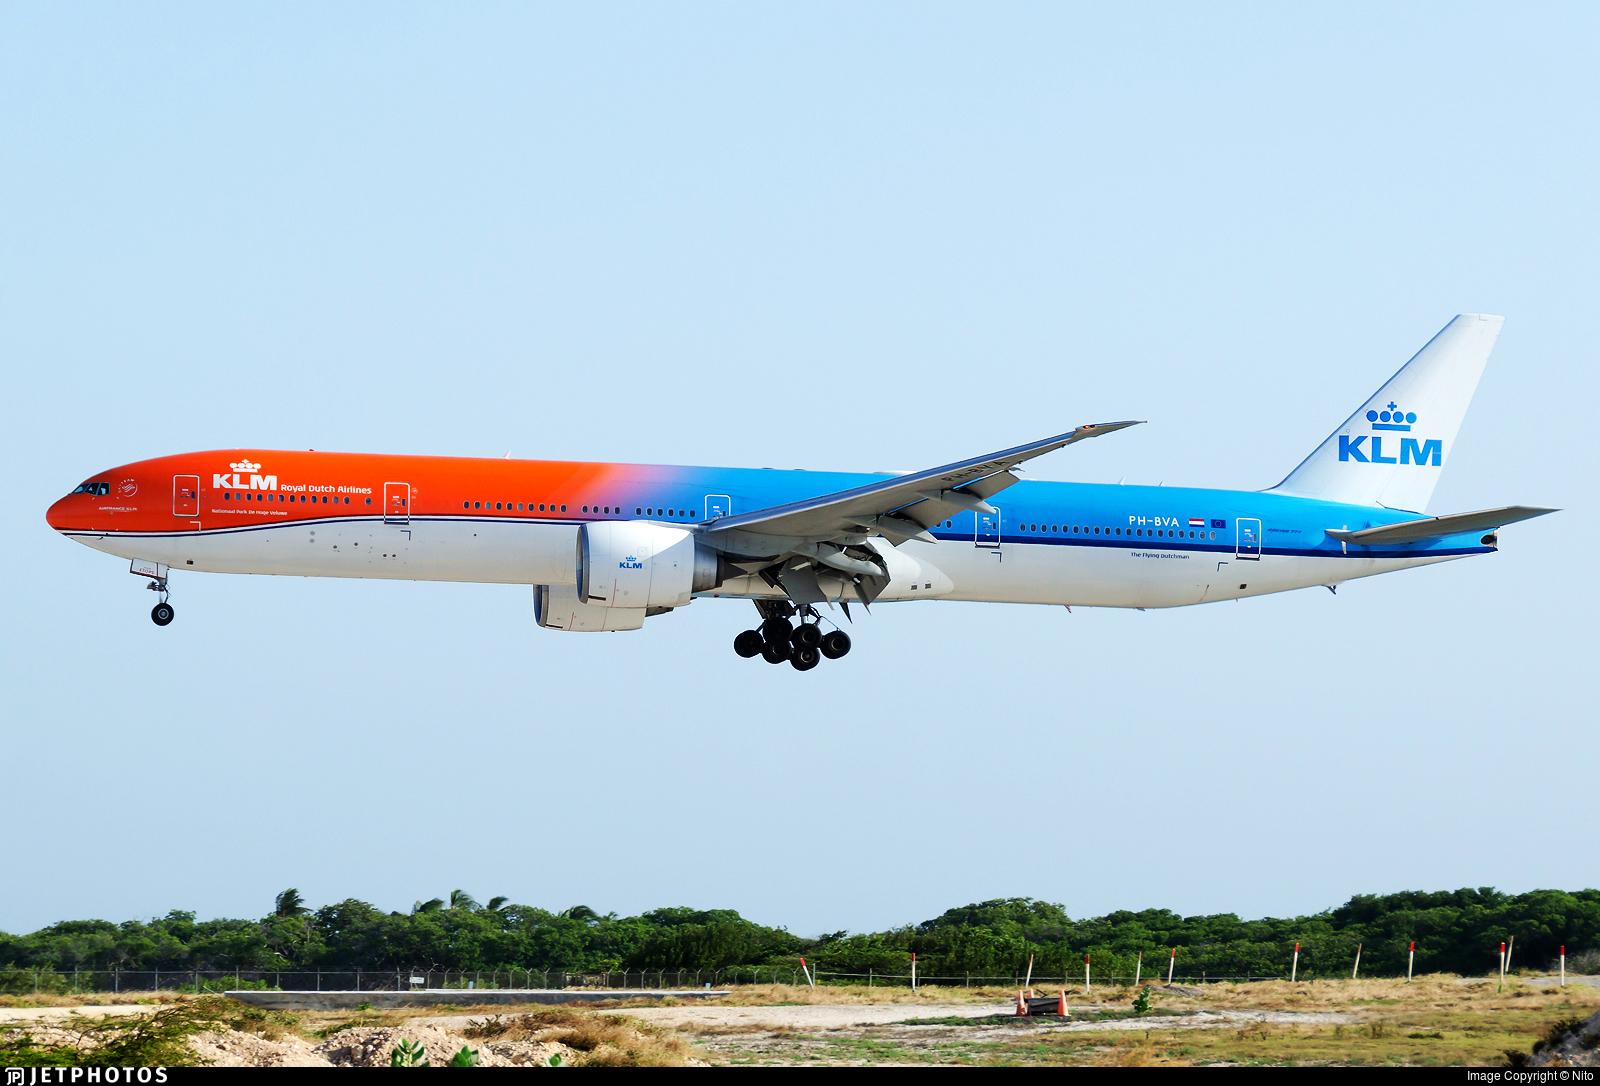 PH-BVA - Boeing 777-306ER - KLM Royal Dutch Airlines